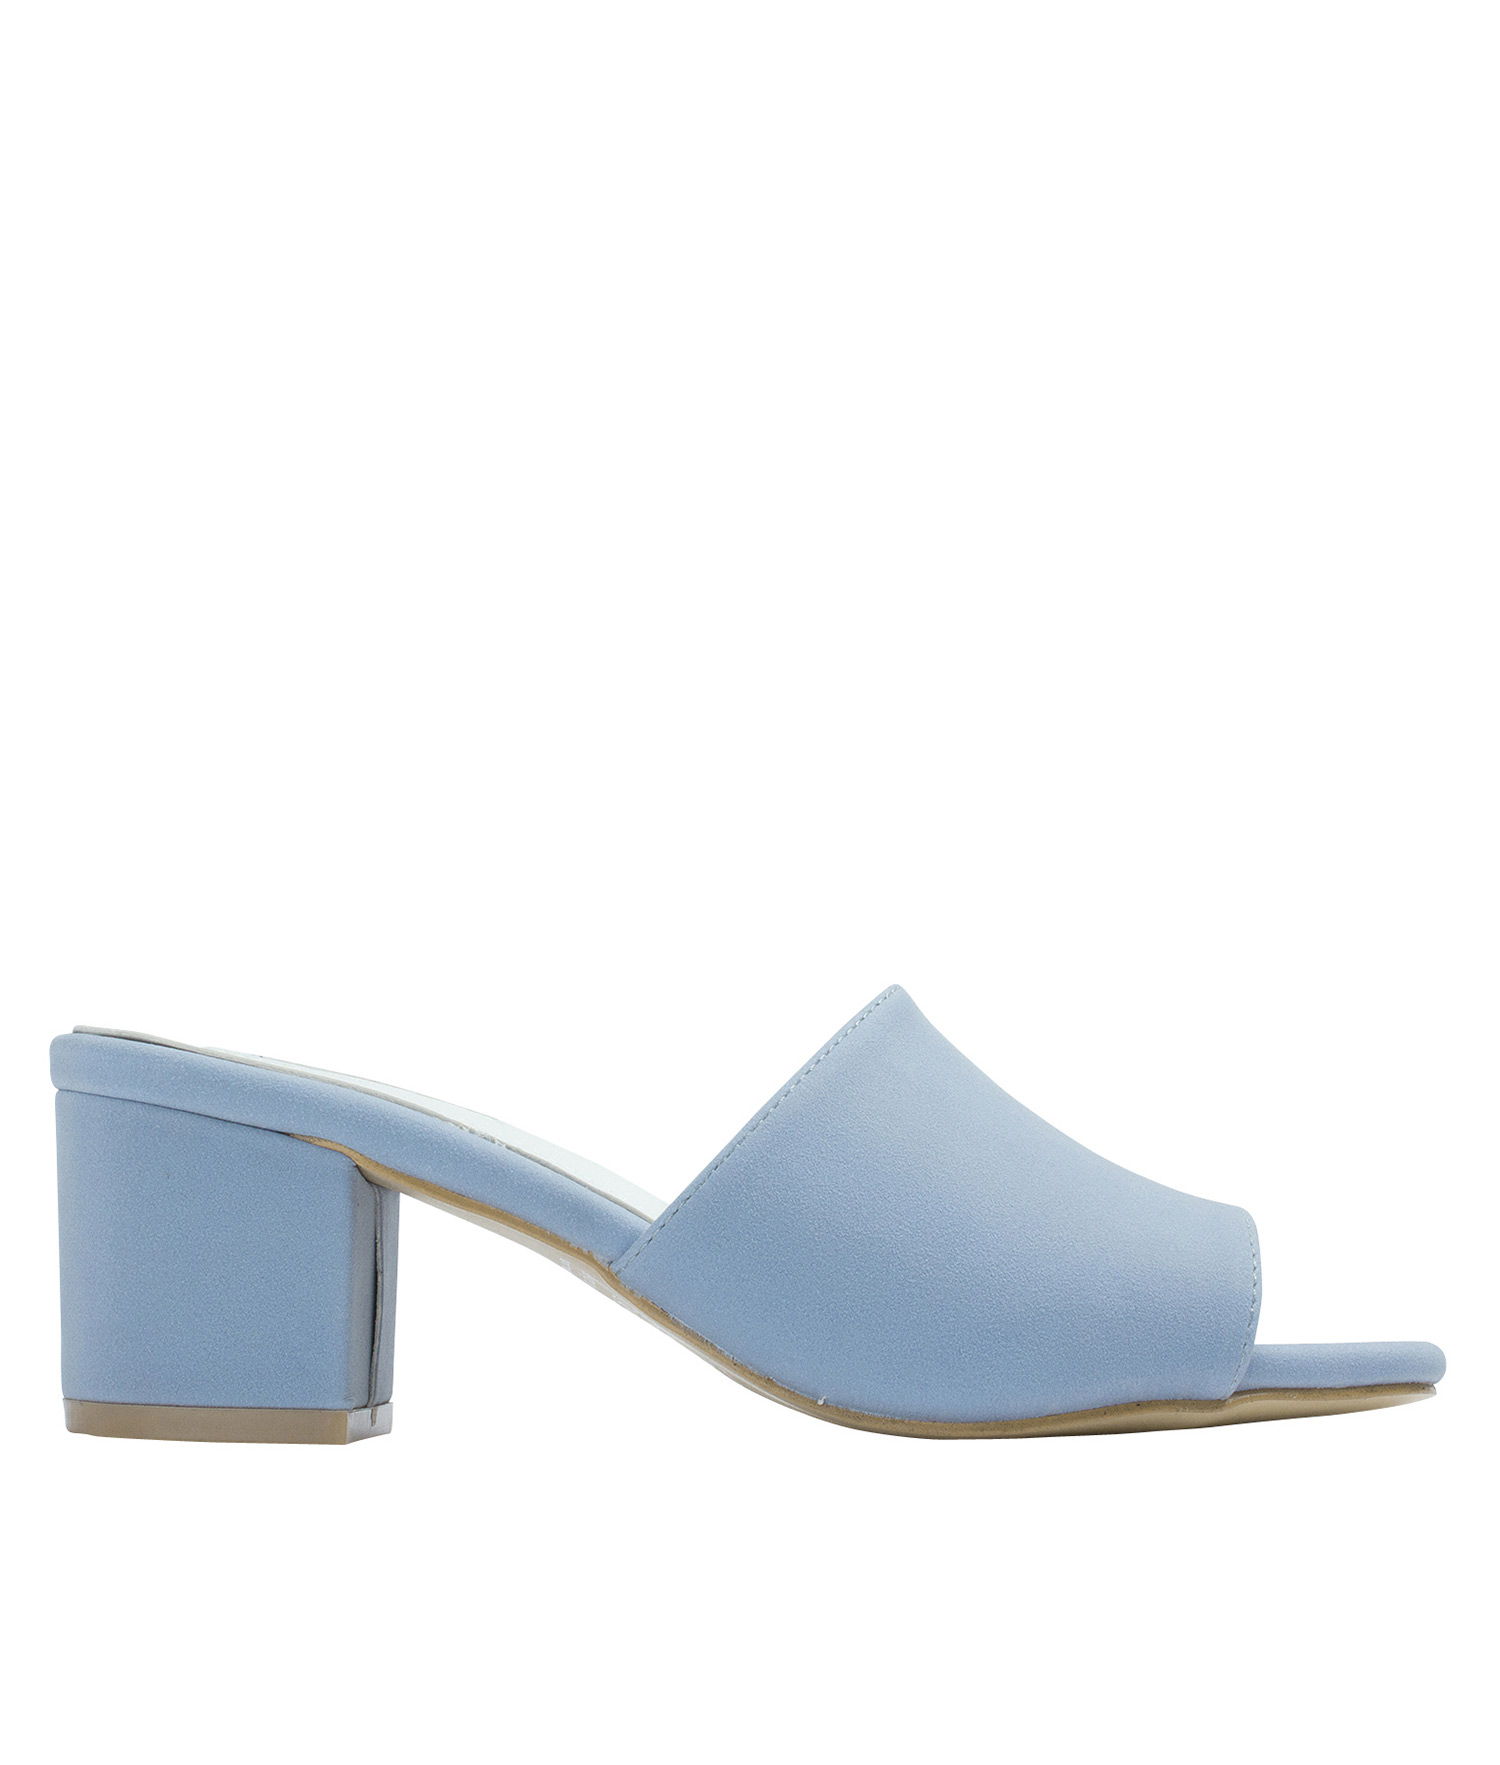 ce3795cd8063 AnnaKastle Womens Faux Suede Open Toe Mules Light Blue